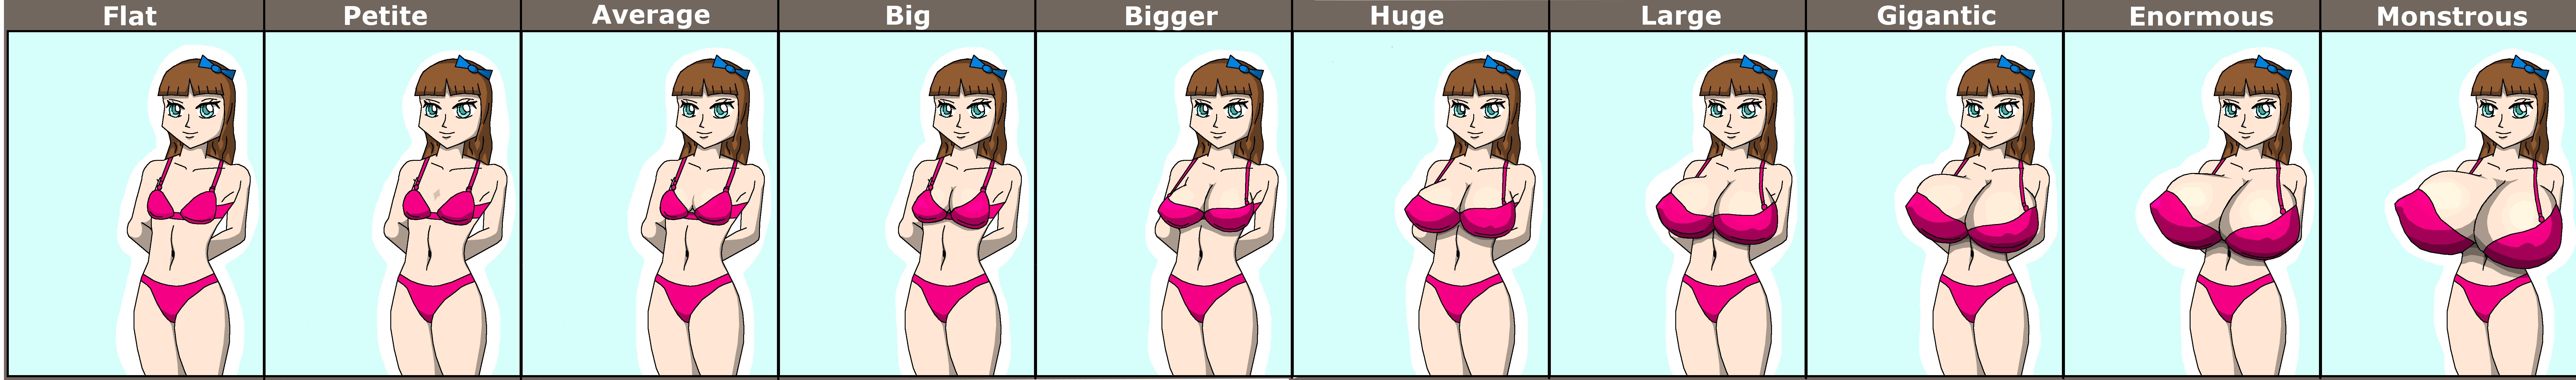 Slutload pantyhose public humiliation